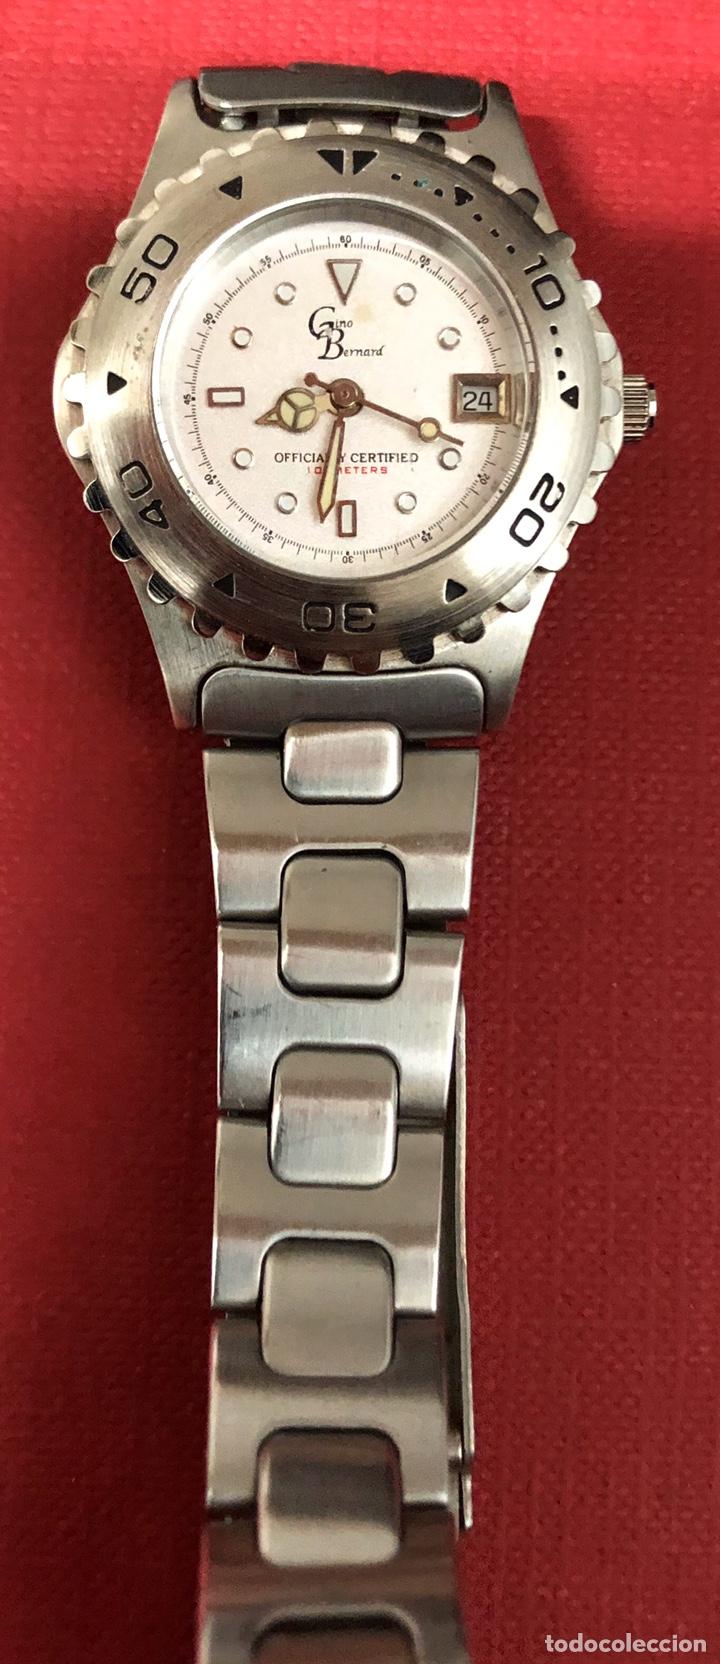 Relojes: Bonito reloj de señora, de cuarzo Gino Bernard. - Foto 2 - 191927088